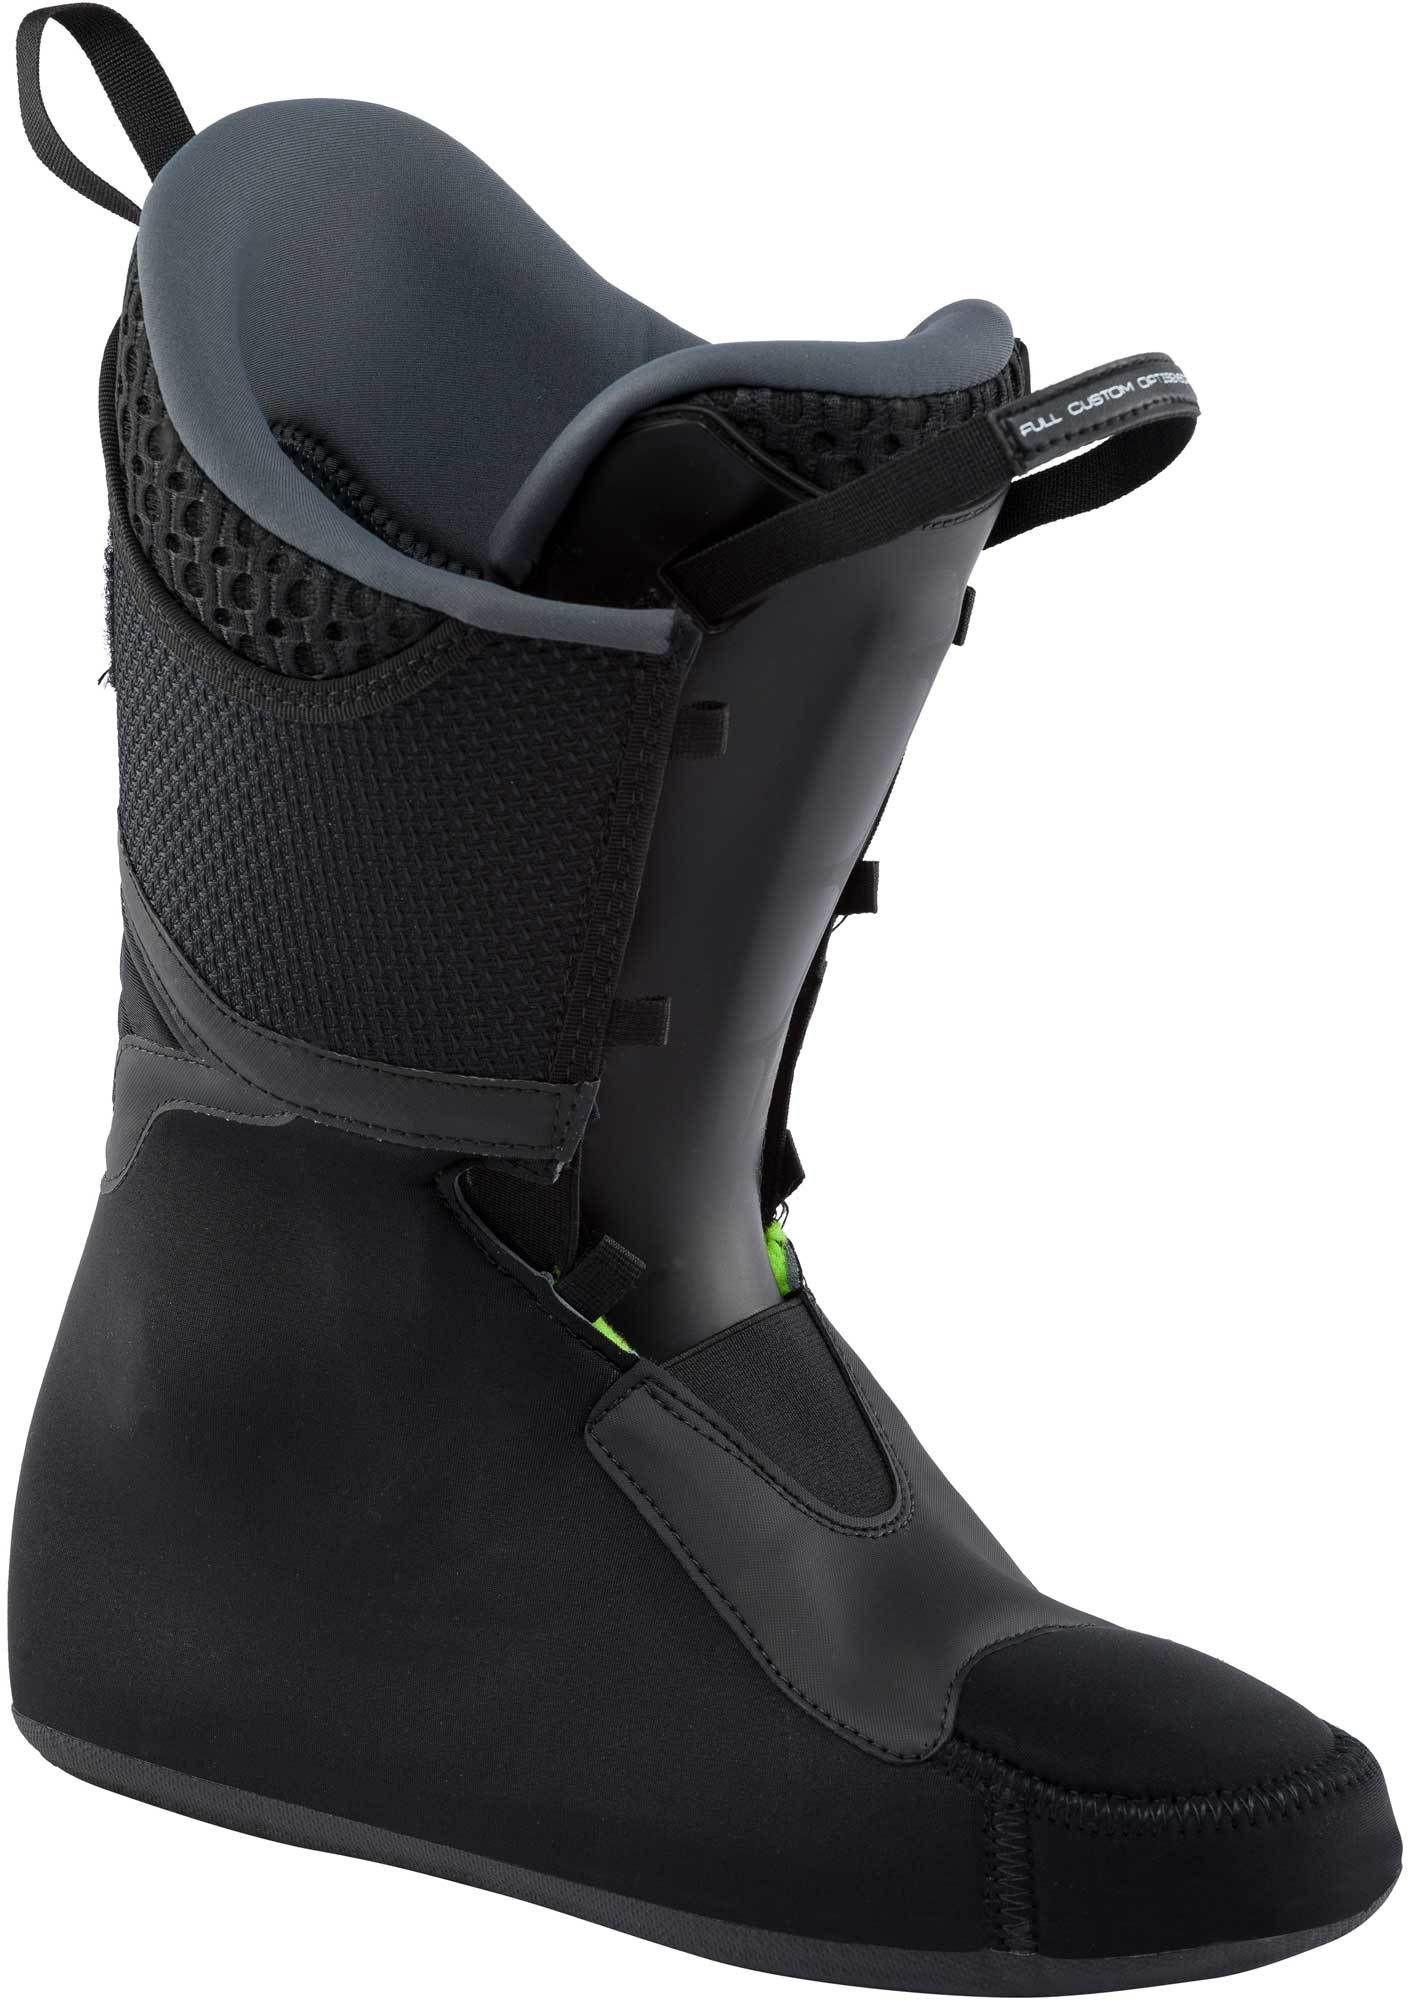 2019-Rossignol-Alltrack-Pro-110LT-Ski-Boots_123094C.jpg